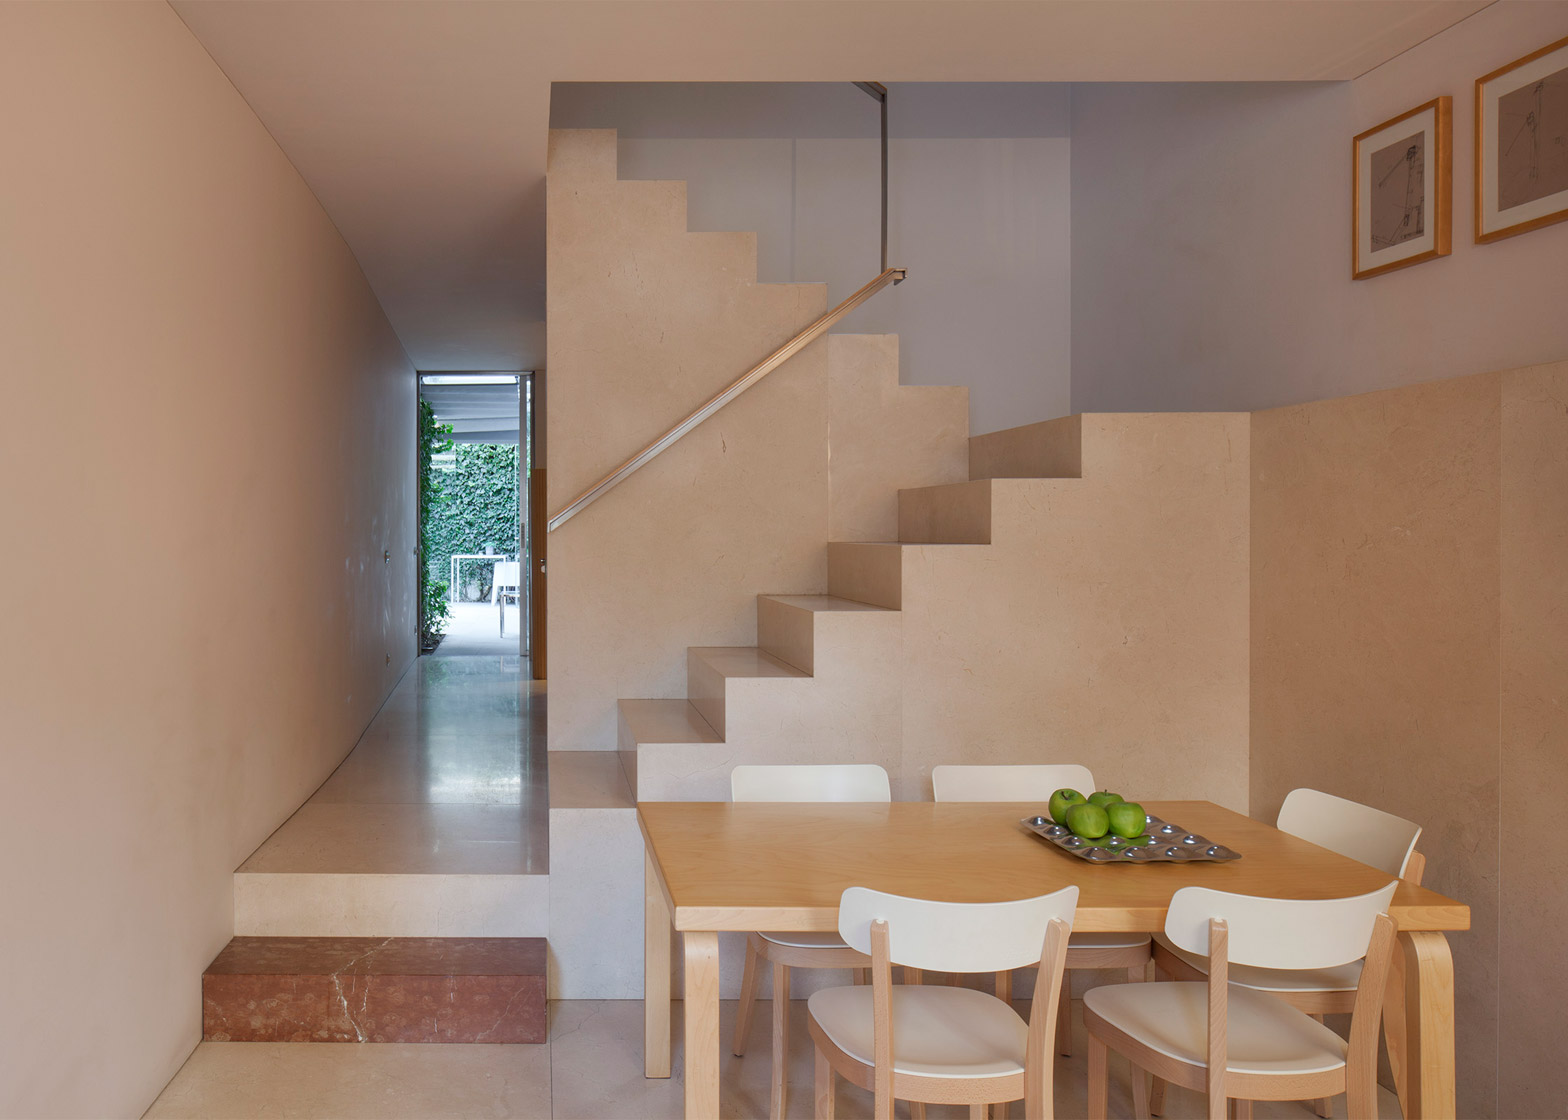 Architecture-courtyard-design-studia-interiors-osnovadesign-osnova-poltava-02